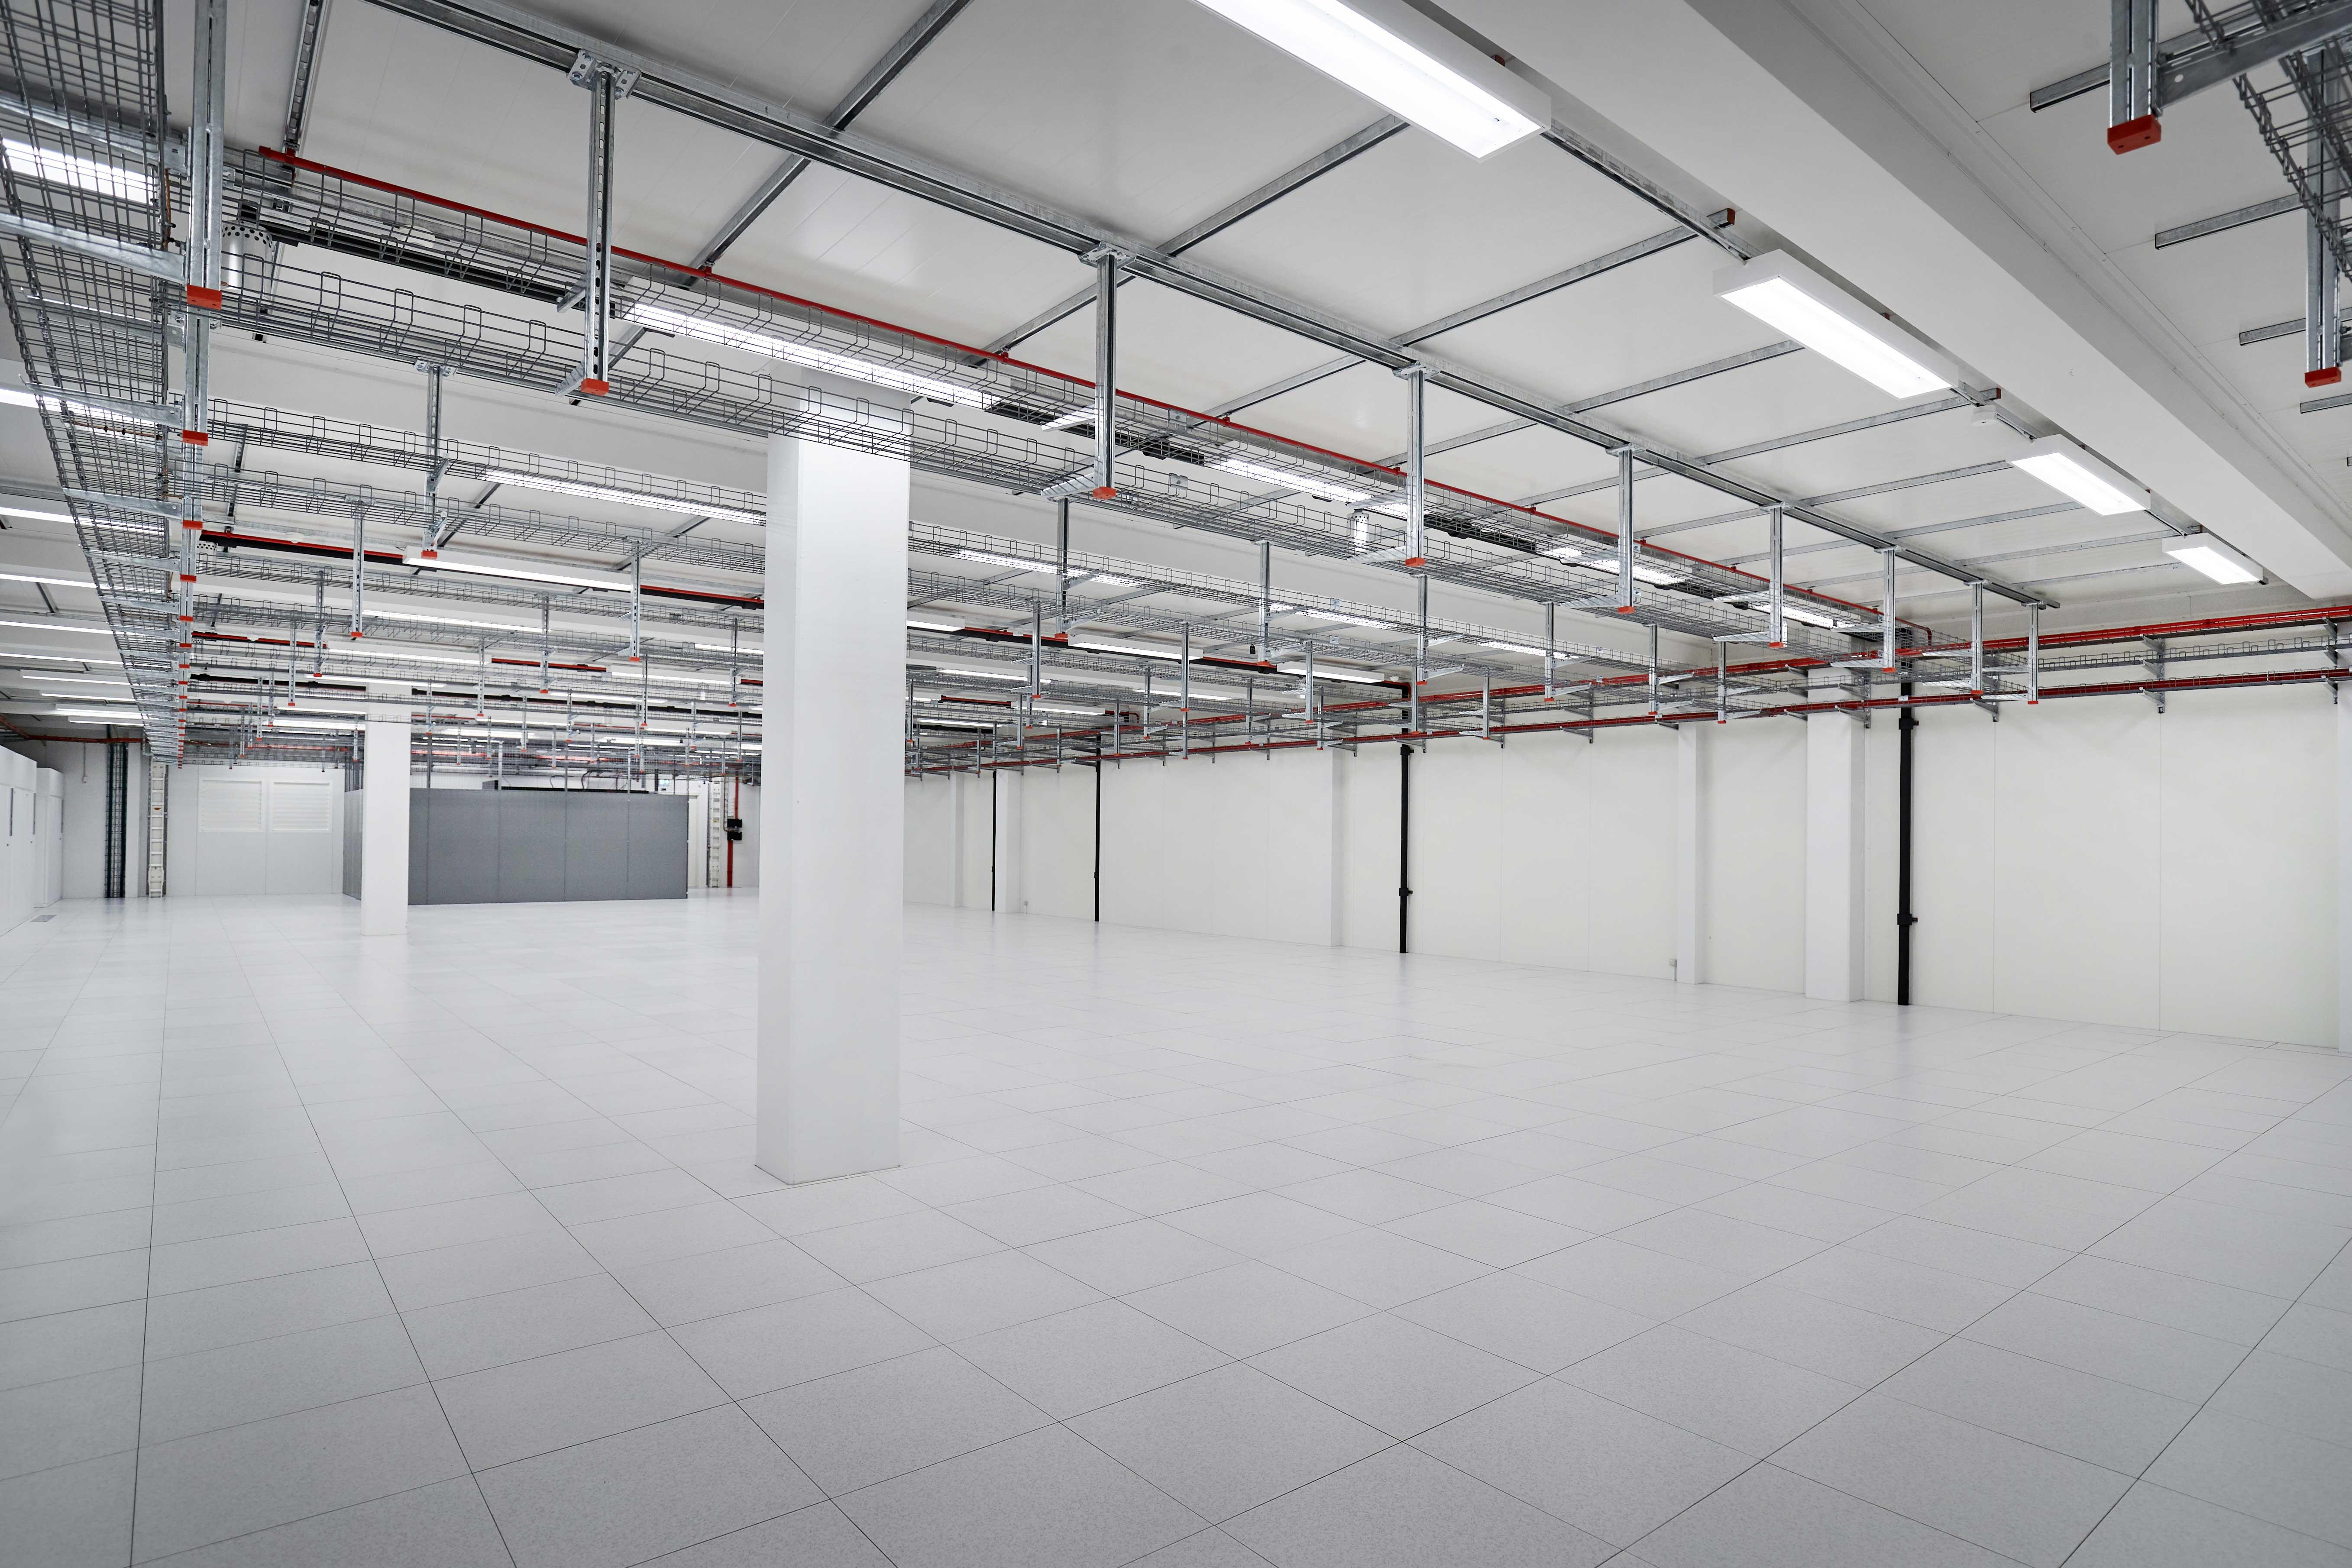 Privata datahallsrum colocation